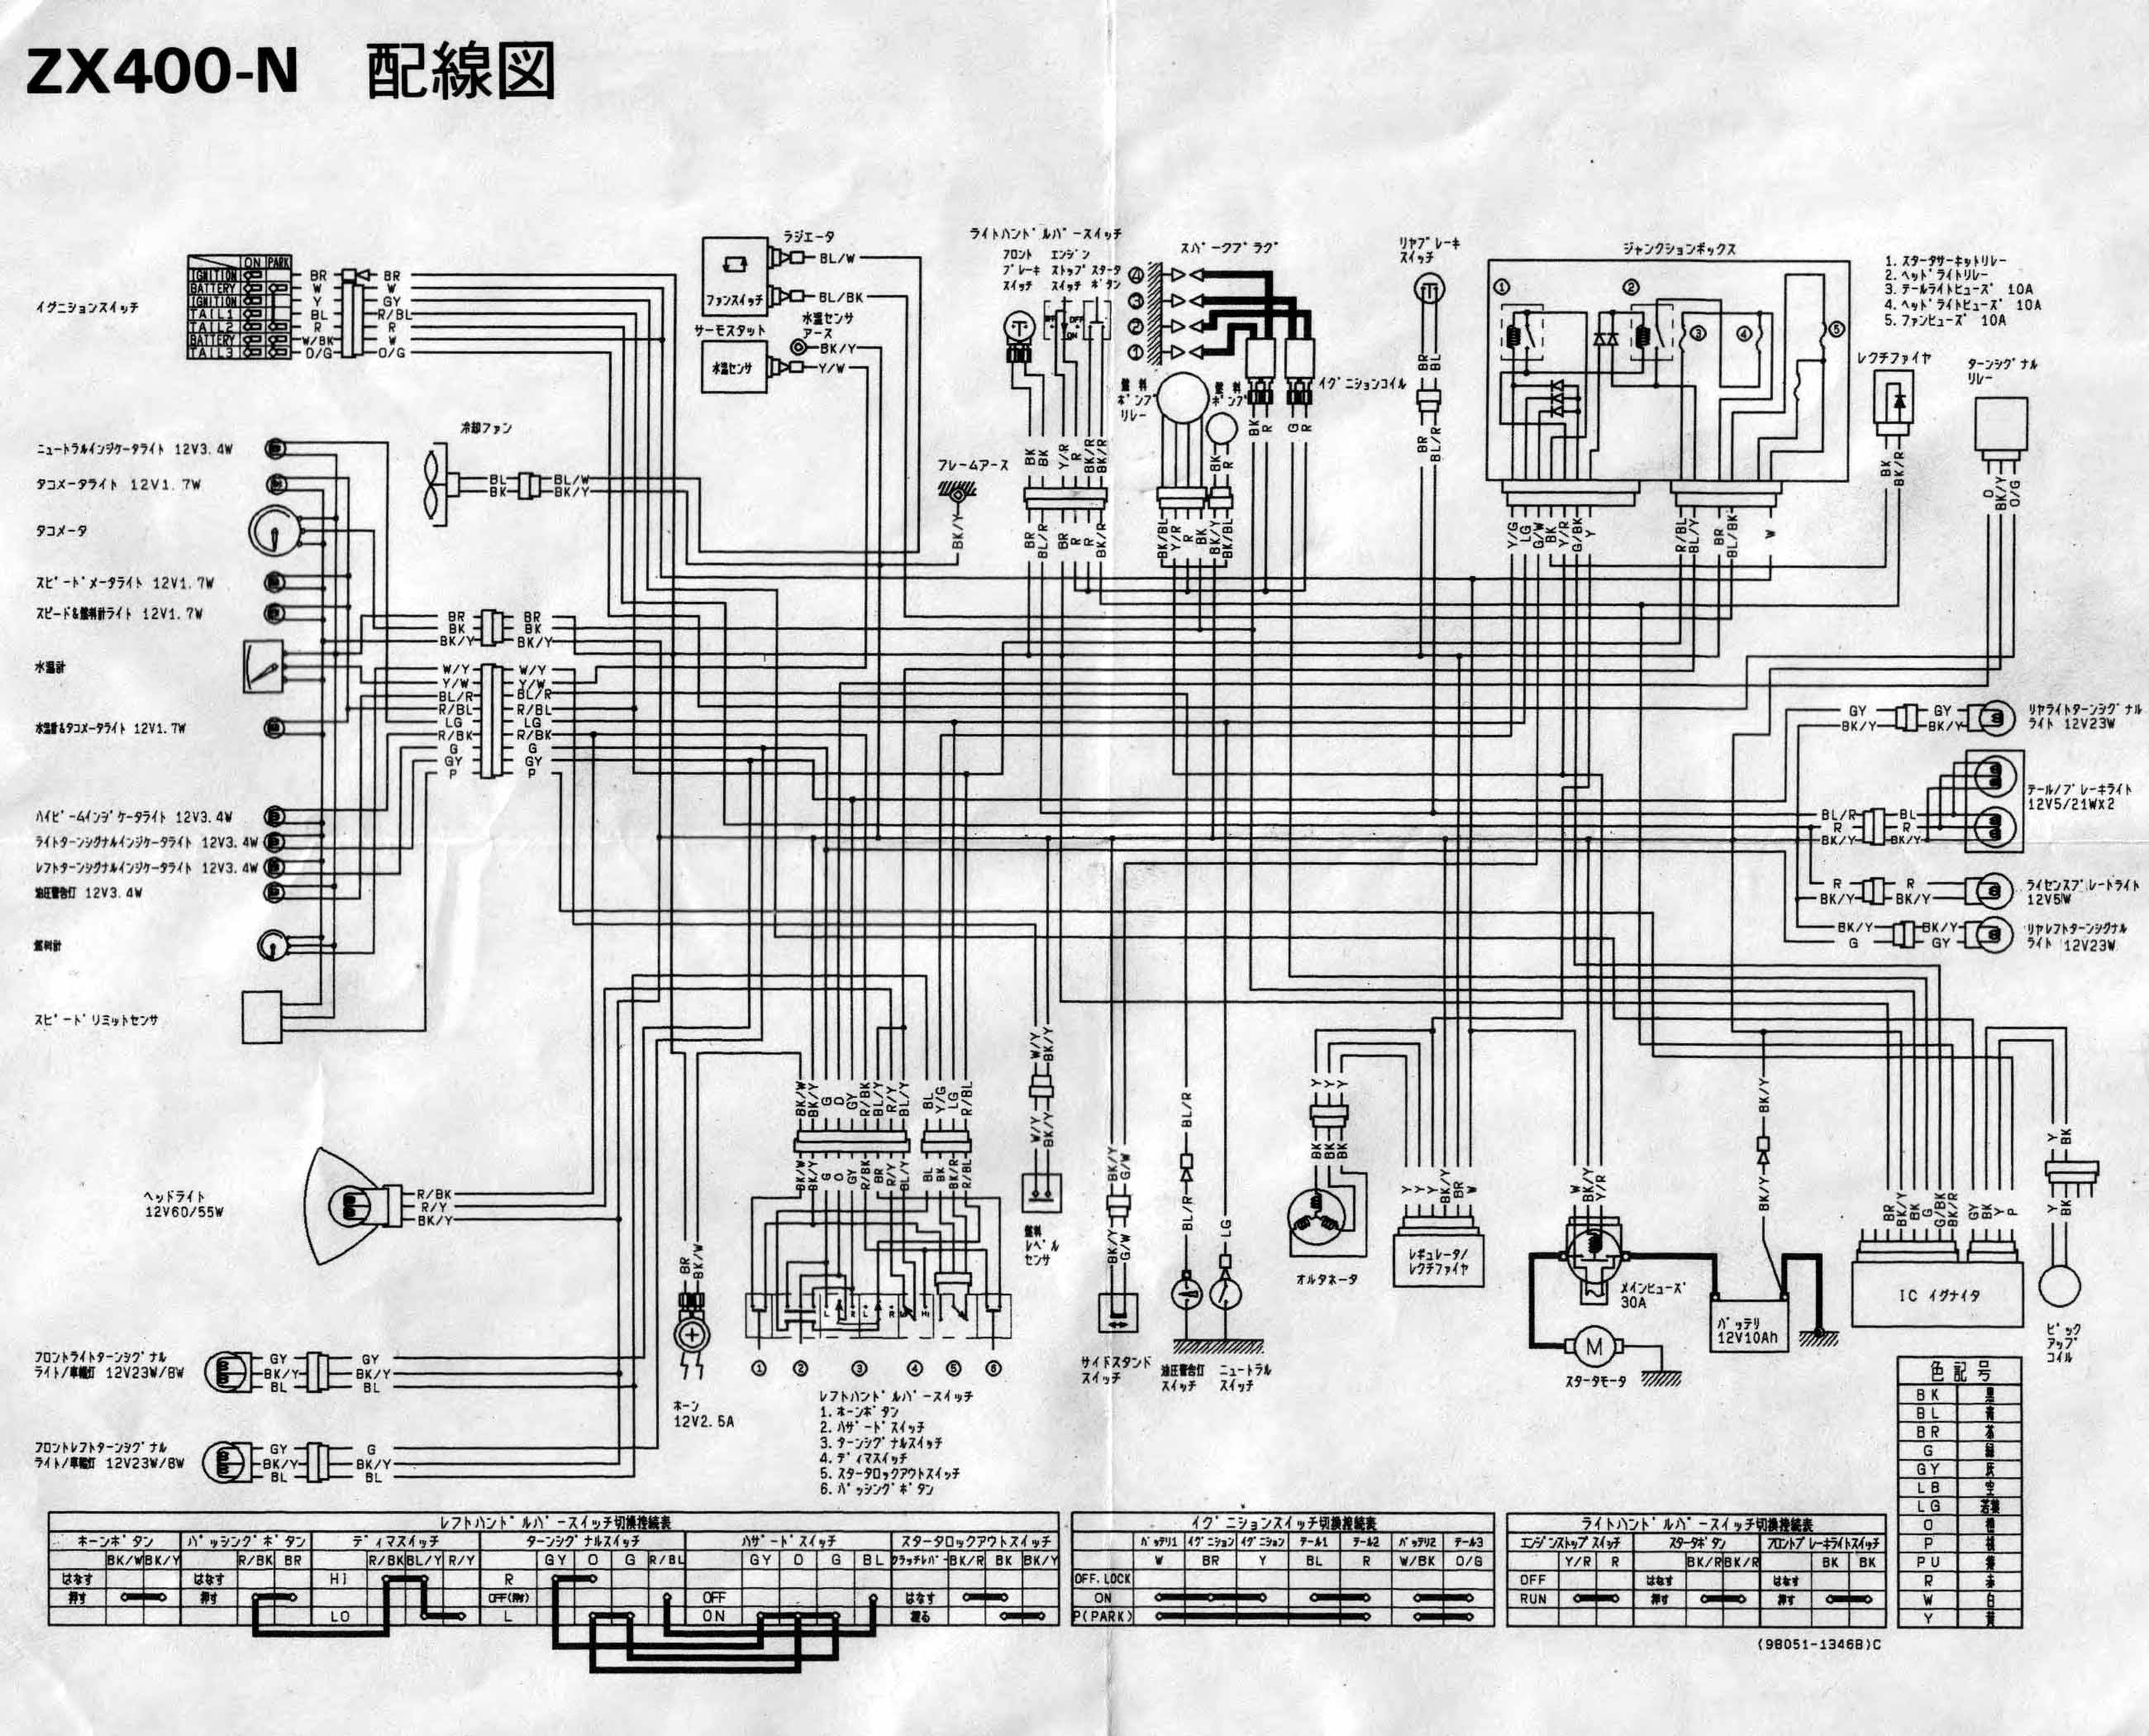 versys 650 wiring diagram data wiring u2022 rh kshjgn pw kawasaki versys 650 wiring diagram